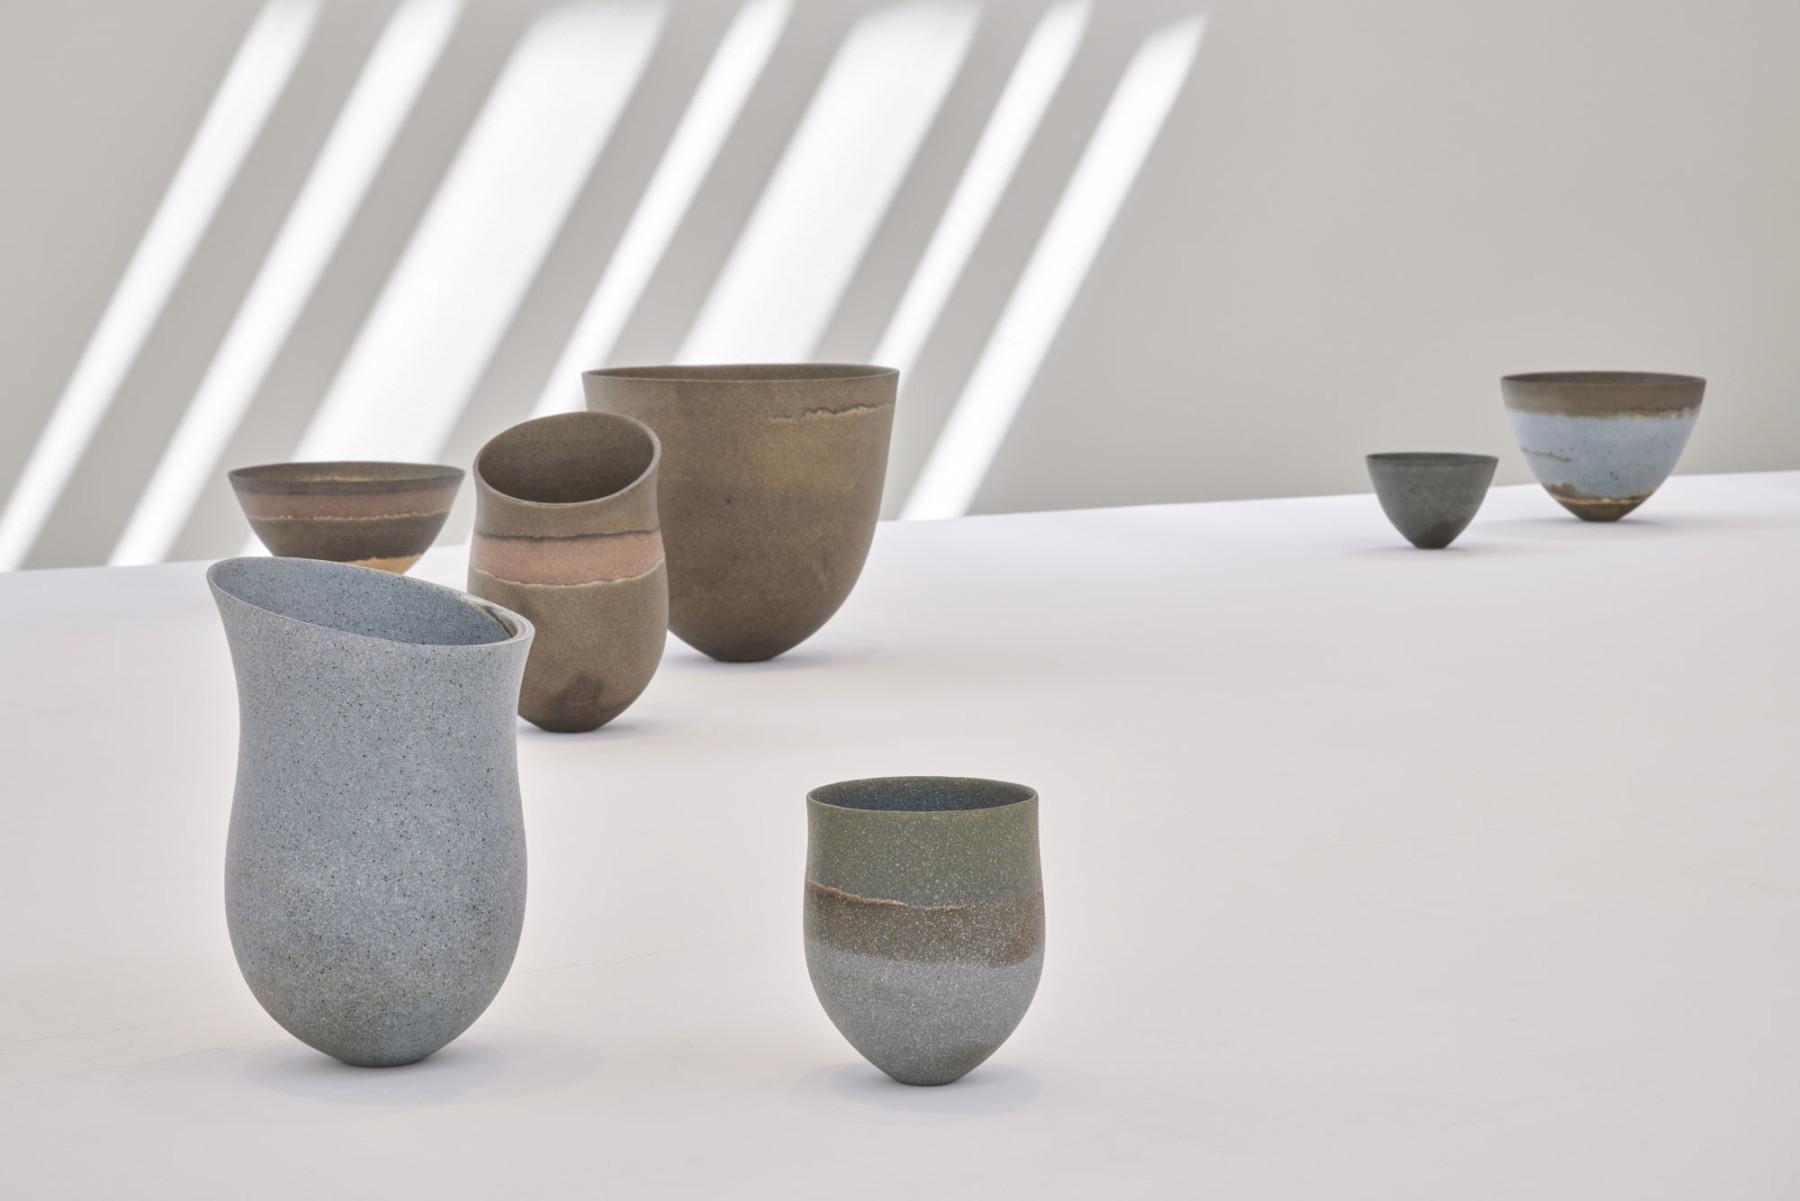 Jamie-fobert-architects-exhibition-design-gallery-Jennifer-Lee Kettles-Yard Jo-Underhill-874